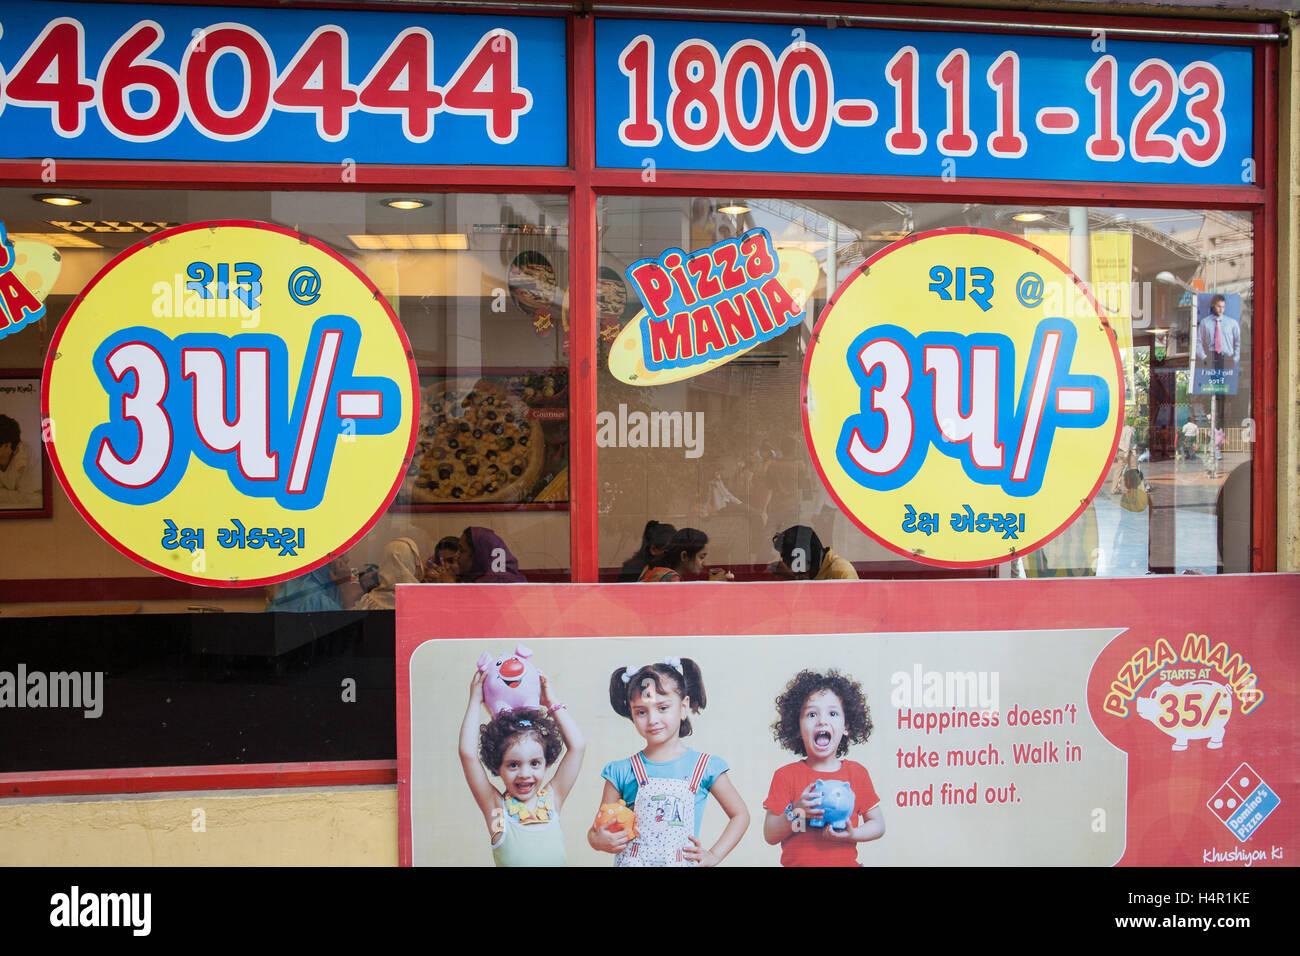 At Ahmedabad City Mall with shops including Big Bazaar shopping mall,Ahmedabad,Gujurat,India,Asia, - Stock Image